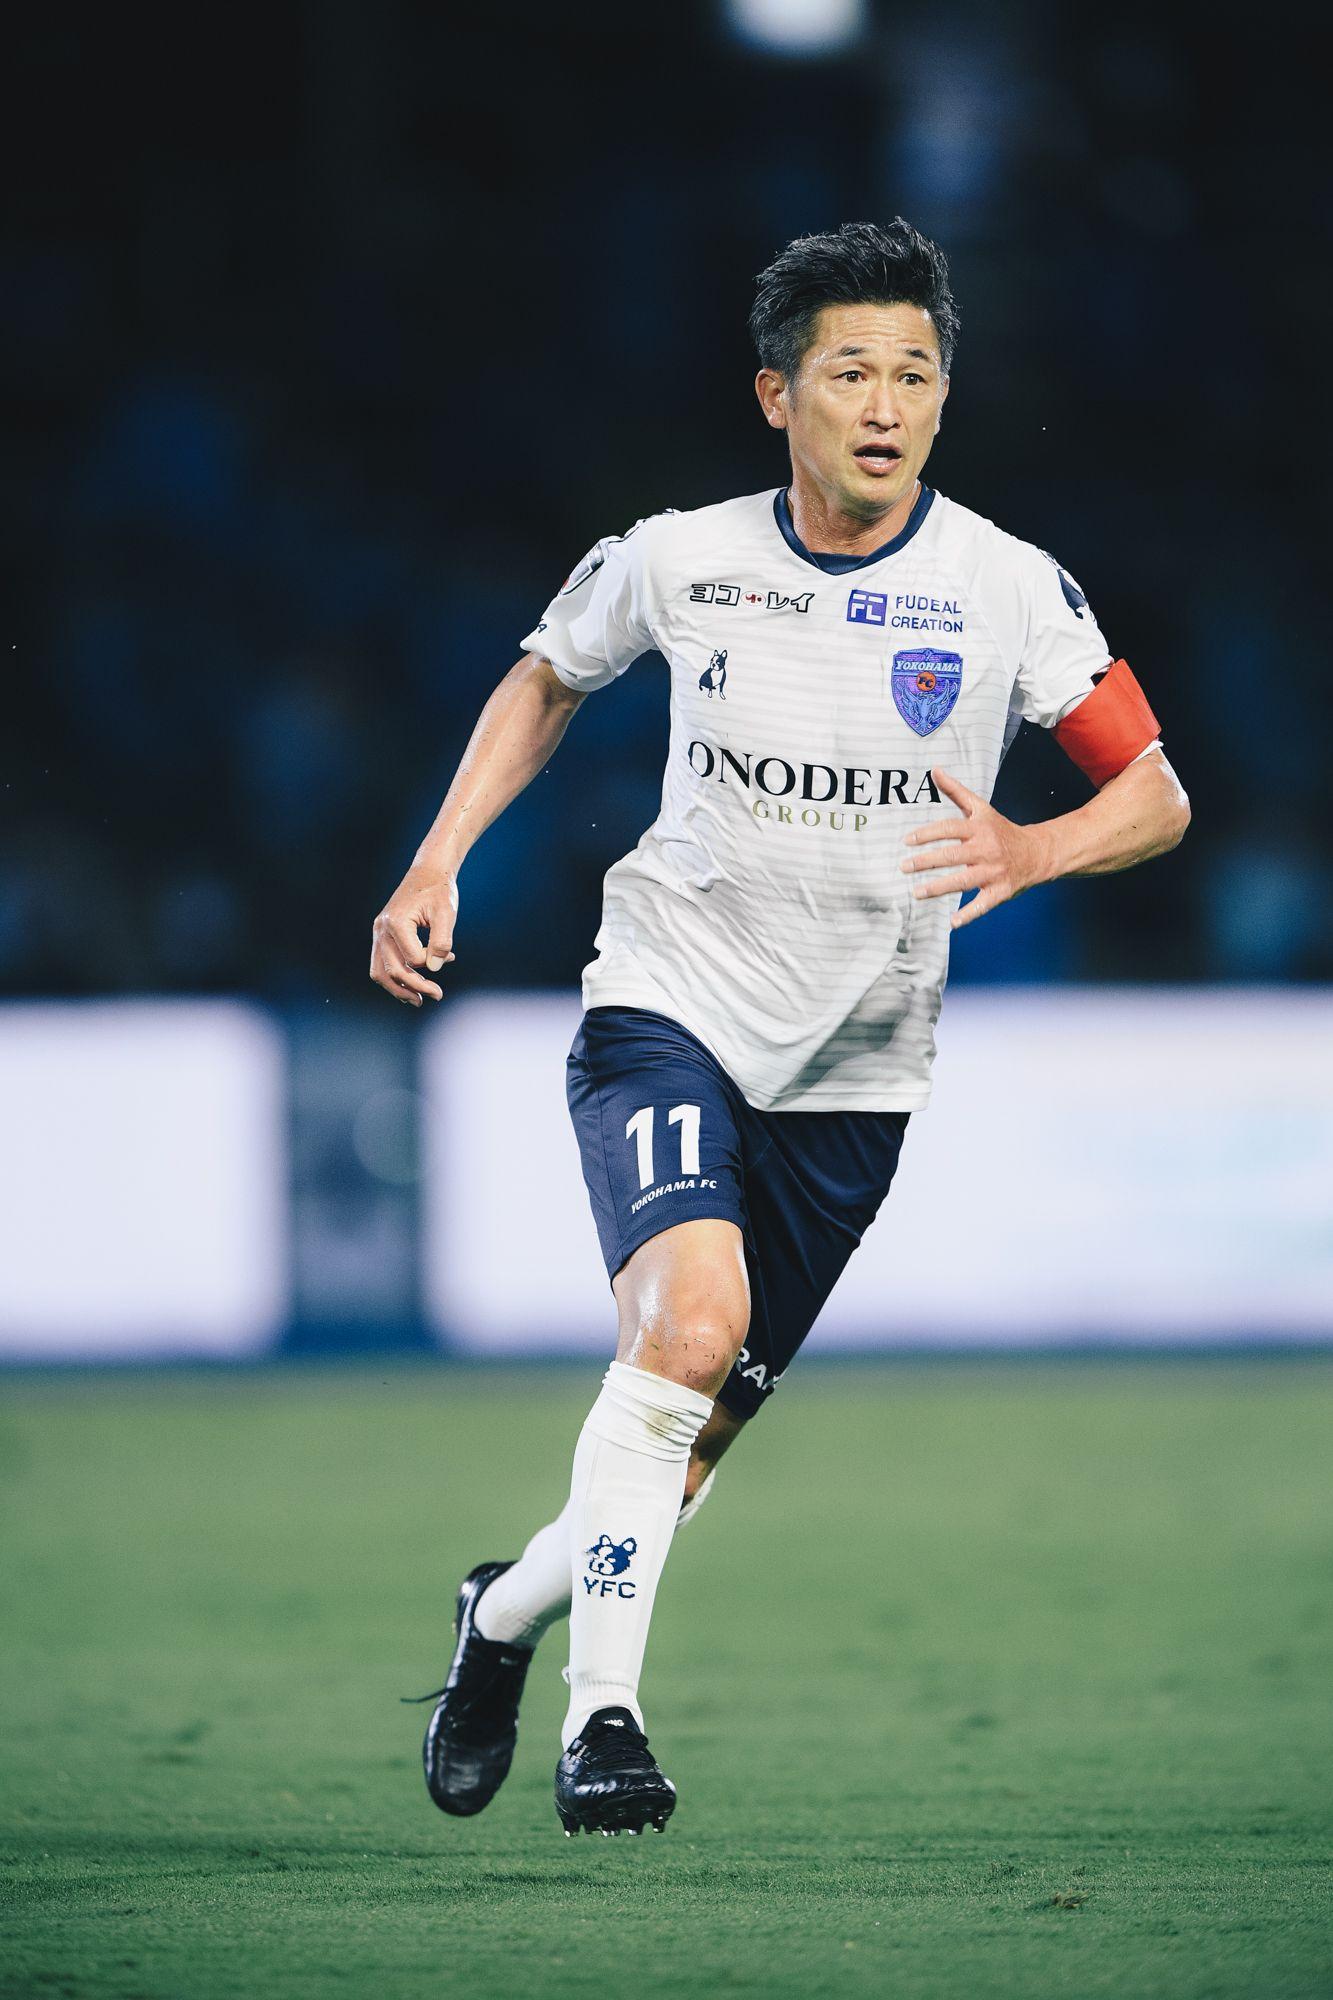 Pemain tertua di dunia saat bermain di J.League, Kazuyoshi Miura.